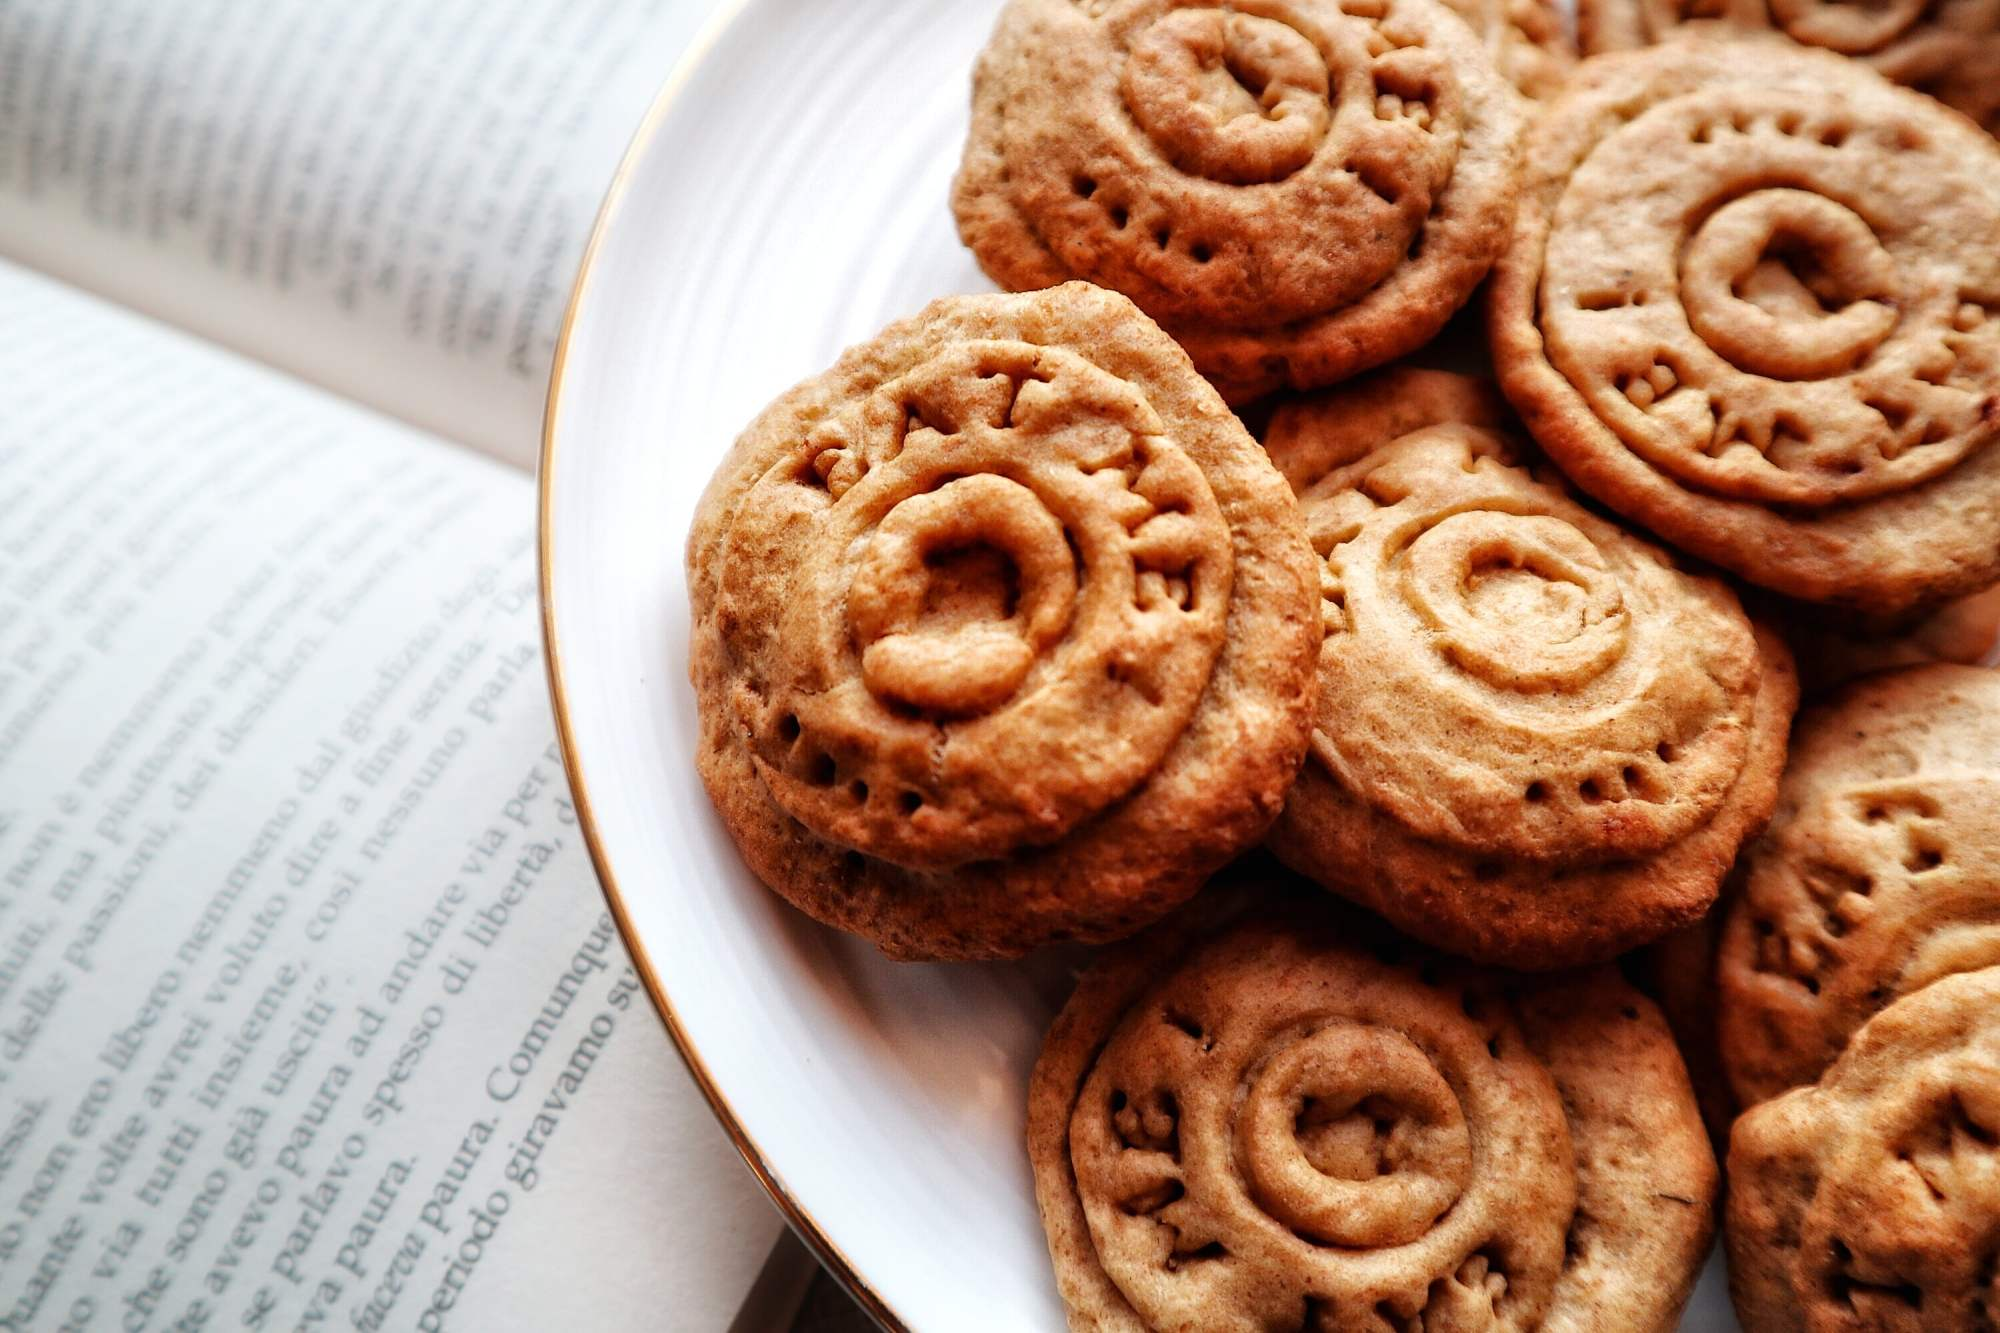 Dolci allo zenzero, mela, mango e ortica: Ingredienti - Non Chiamatela Dieta